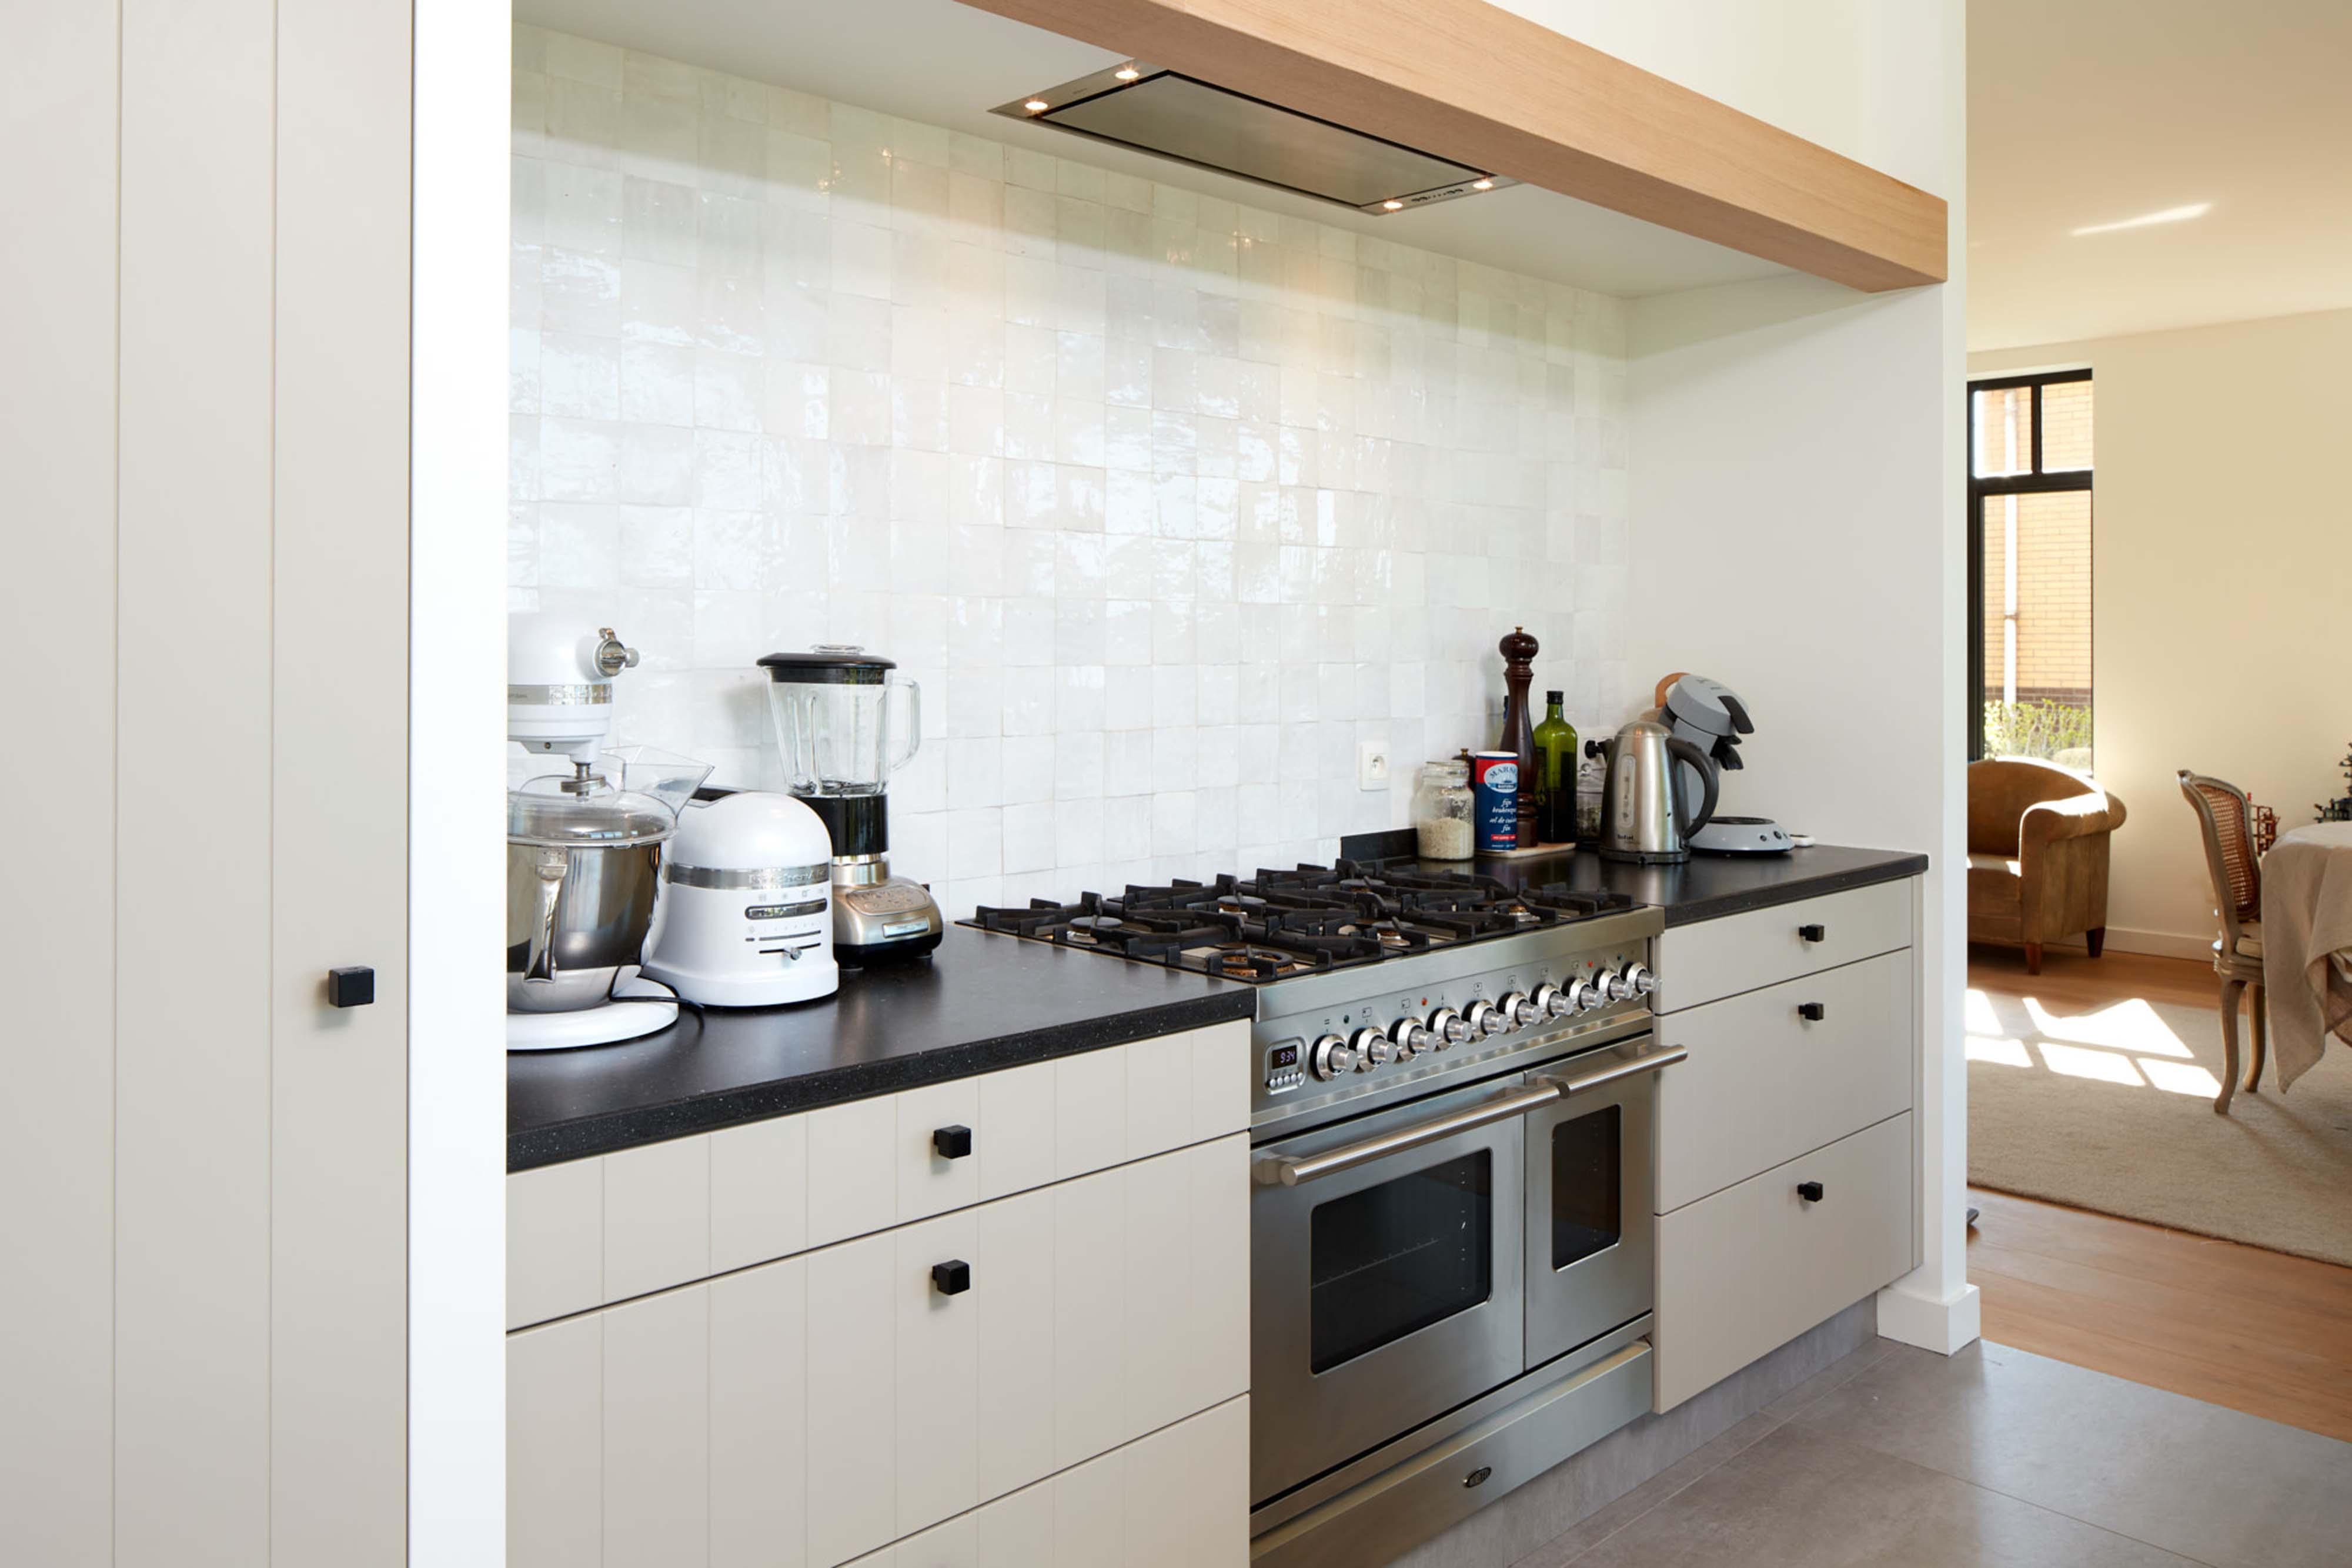 Geel De Keuken : Keukens op maat i antwerpse kempen i webo keukens